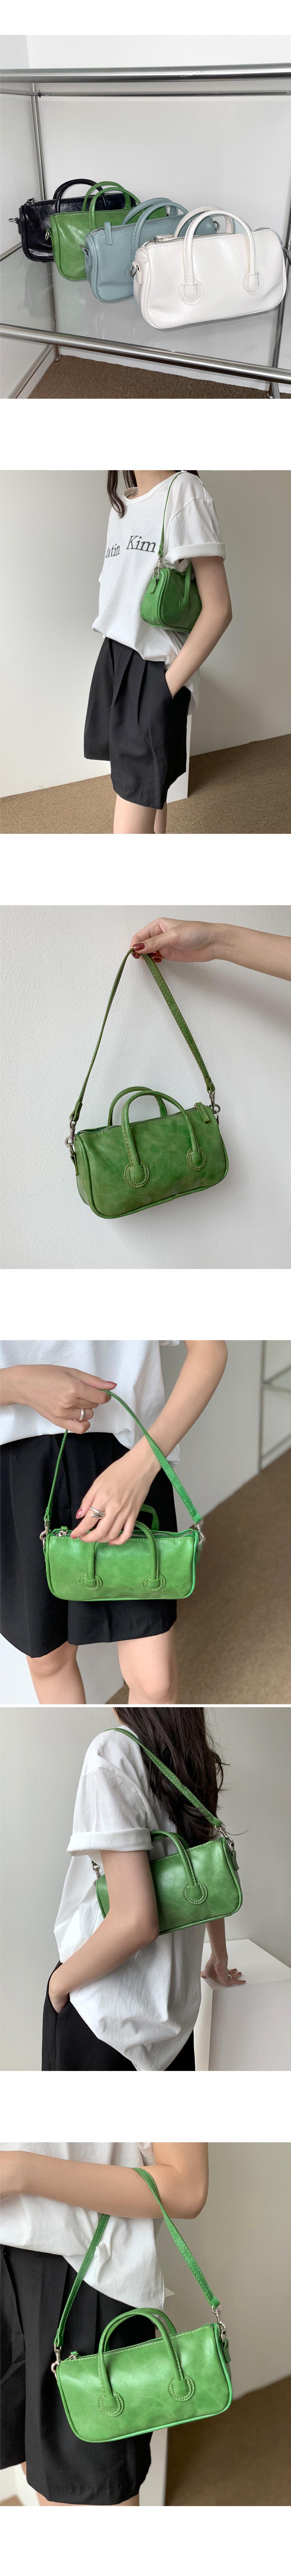 Seren Mini Baguette School Shoulder Bag